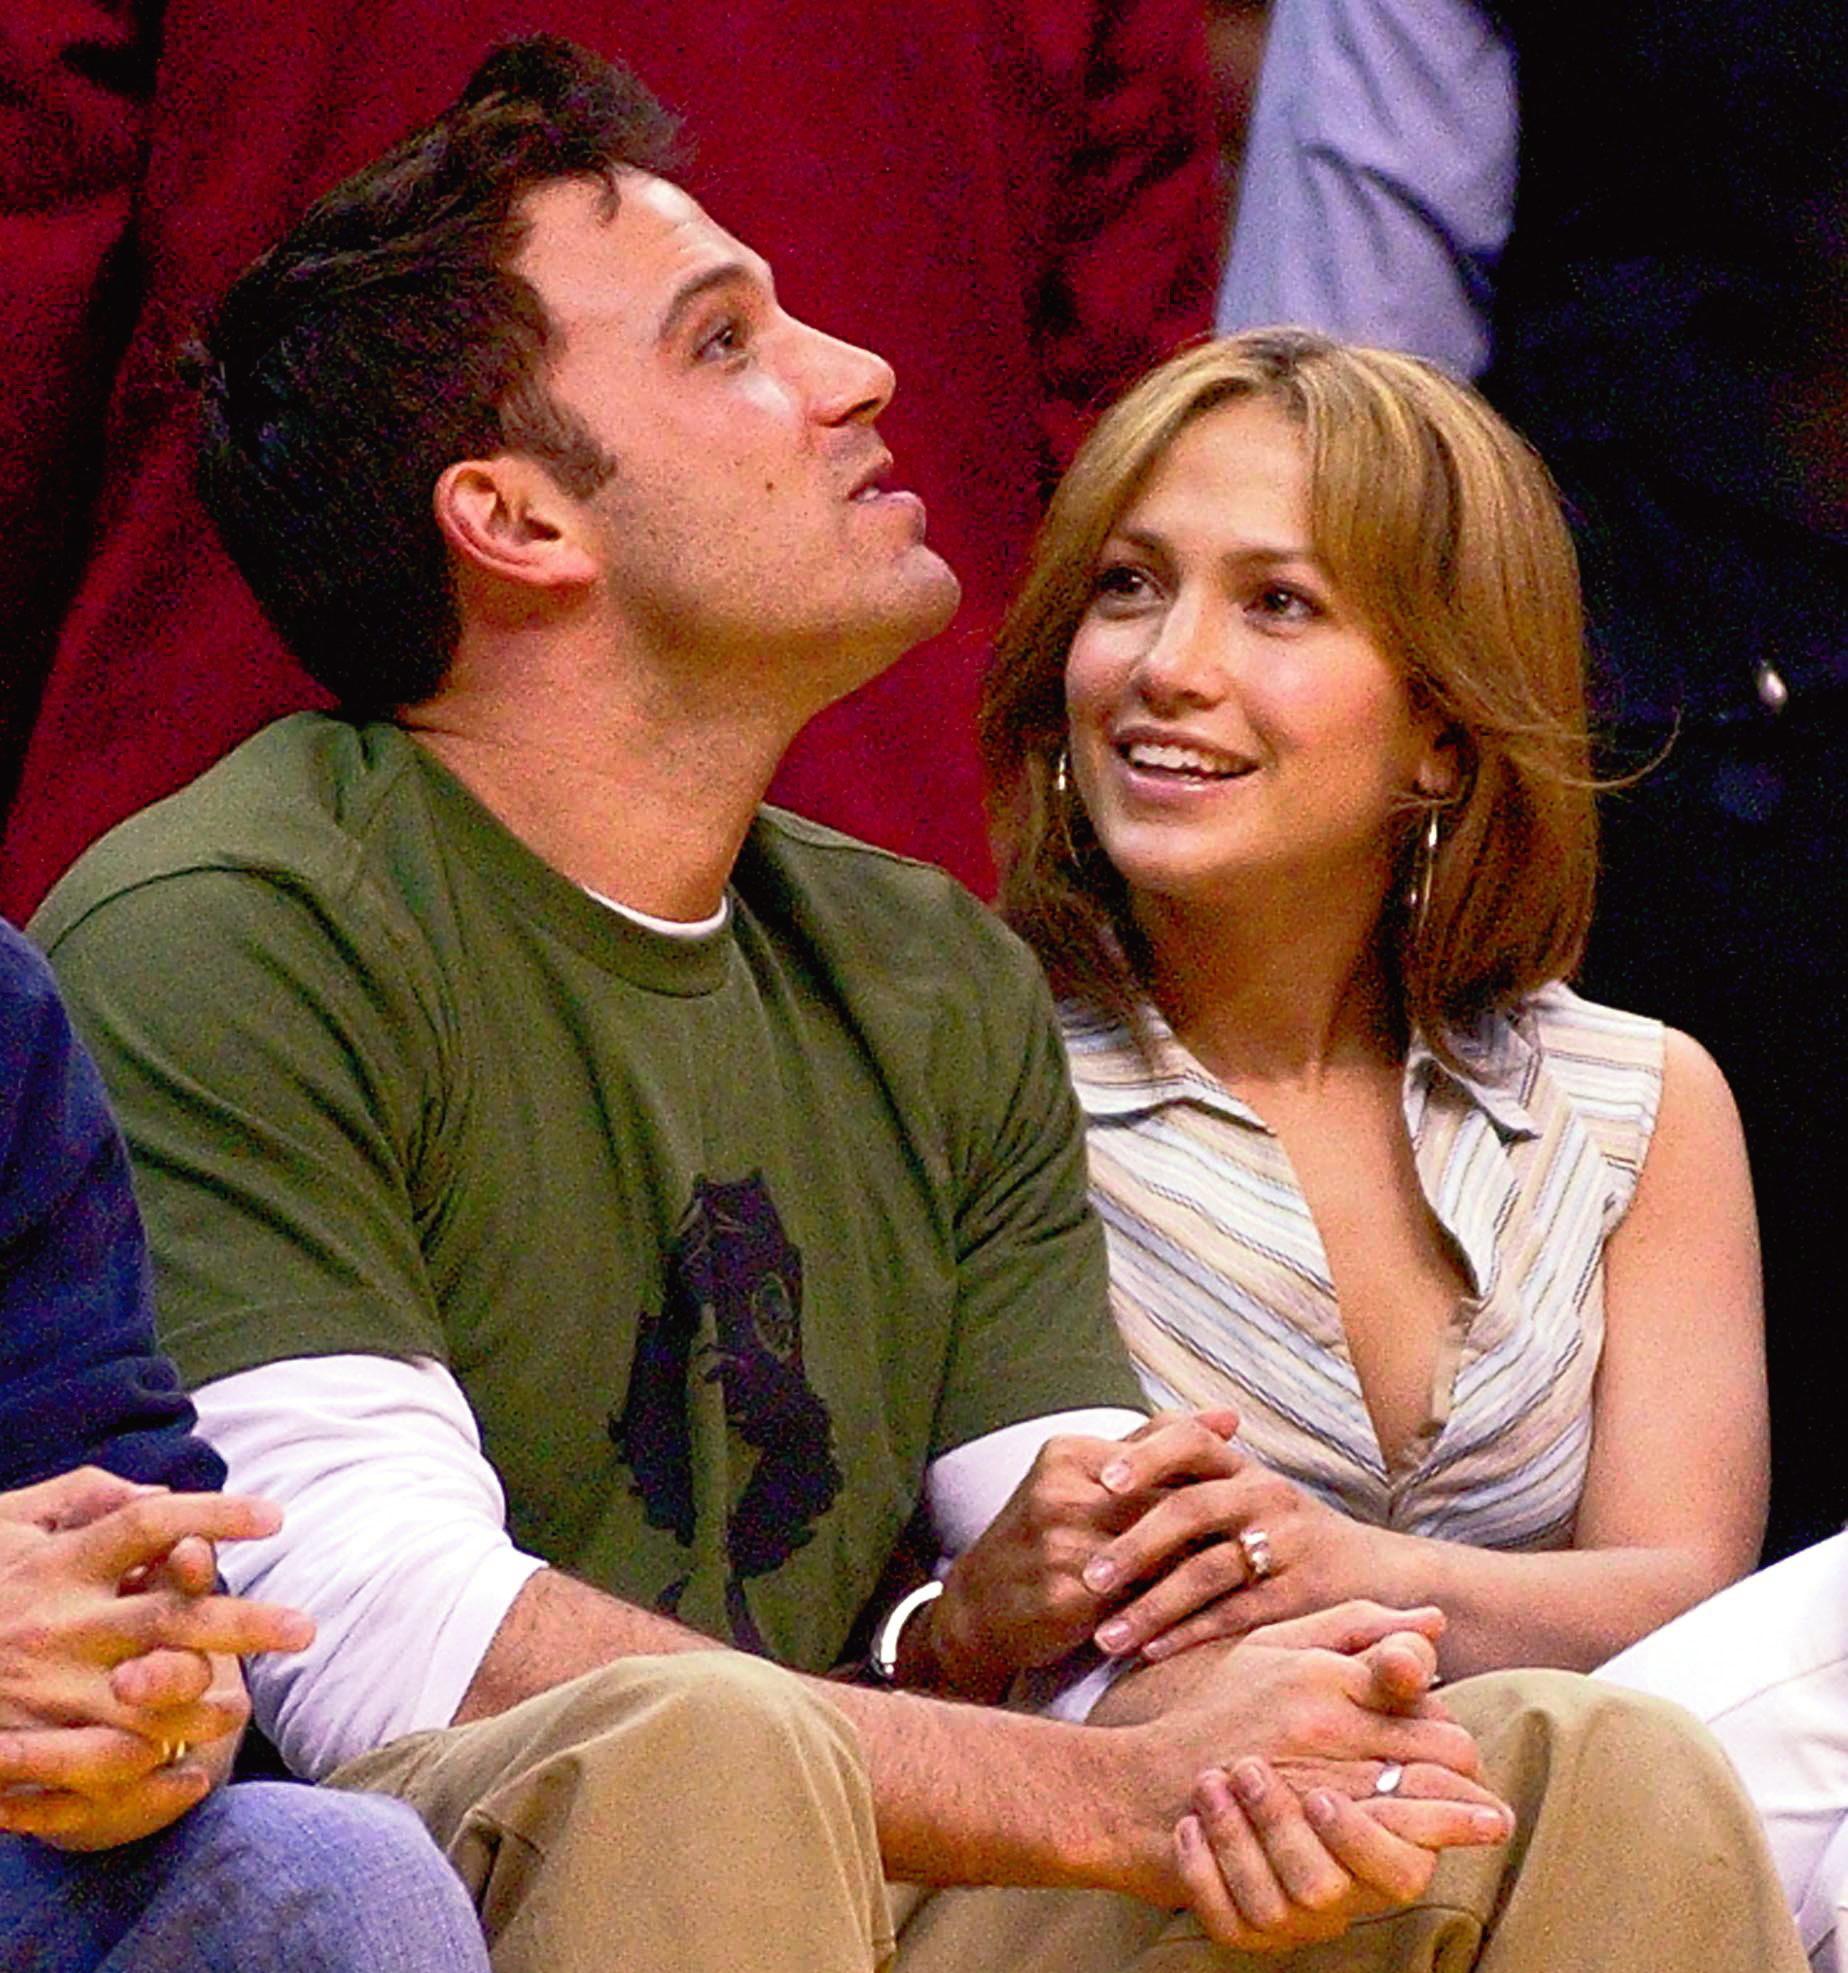 Ben Affleck y Jennifer Lopez, en una imagen de 2003.